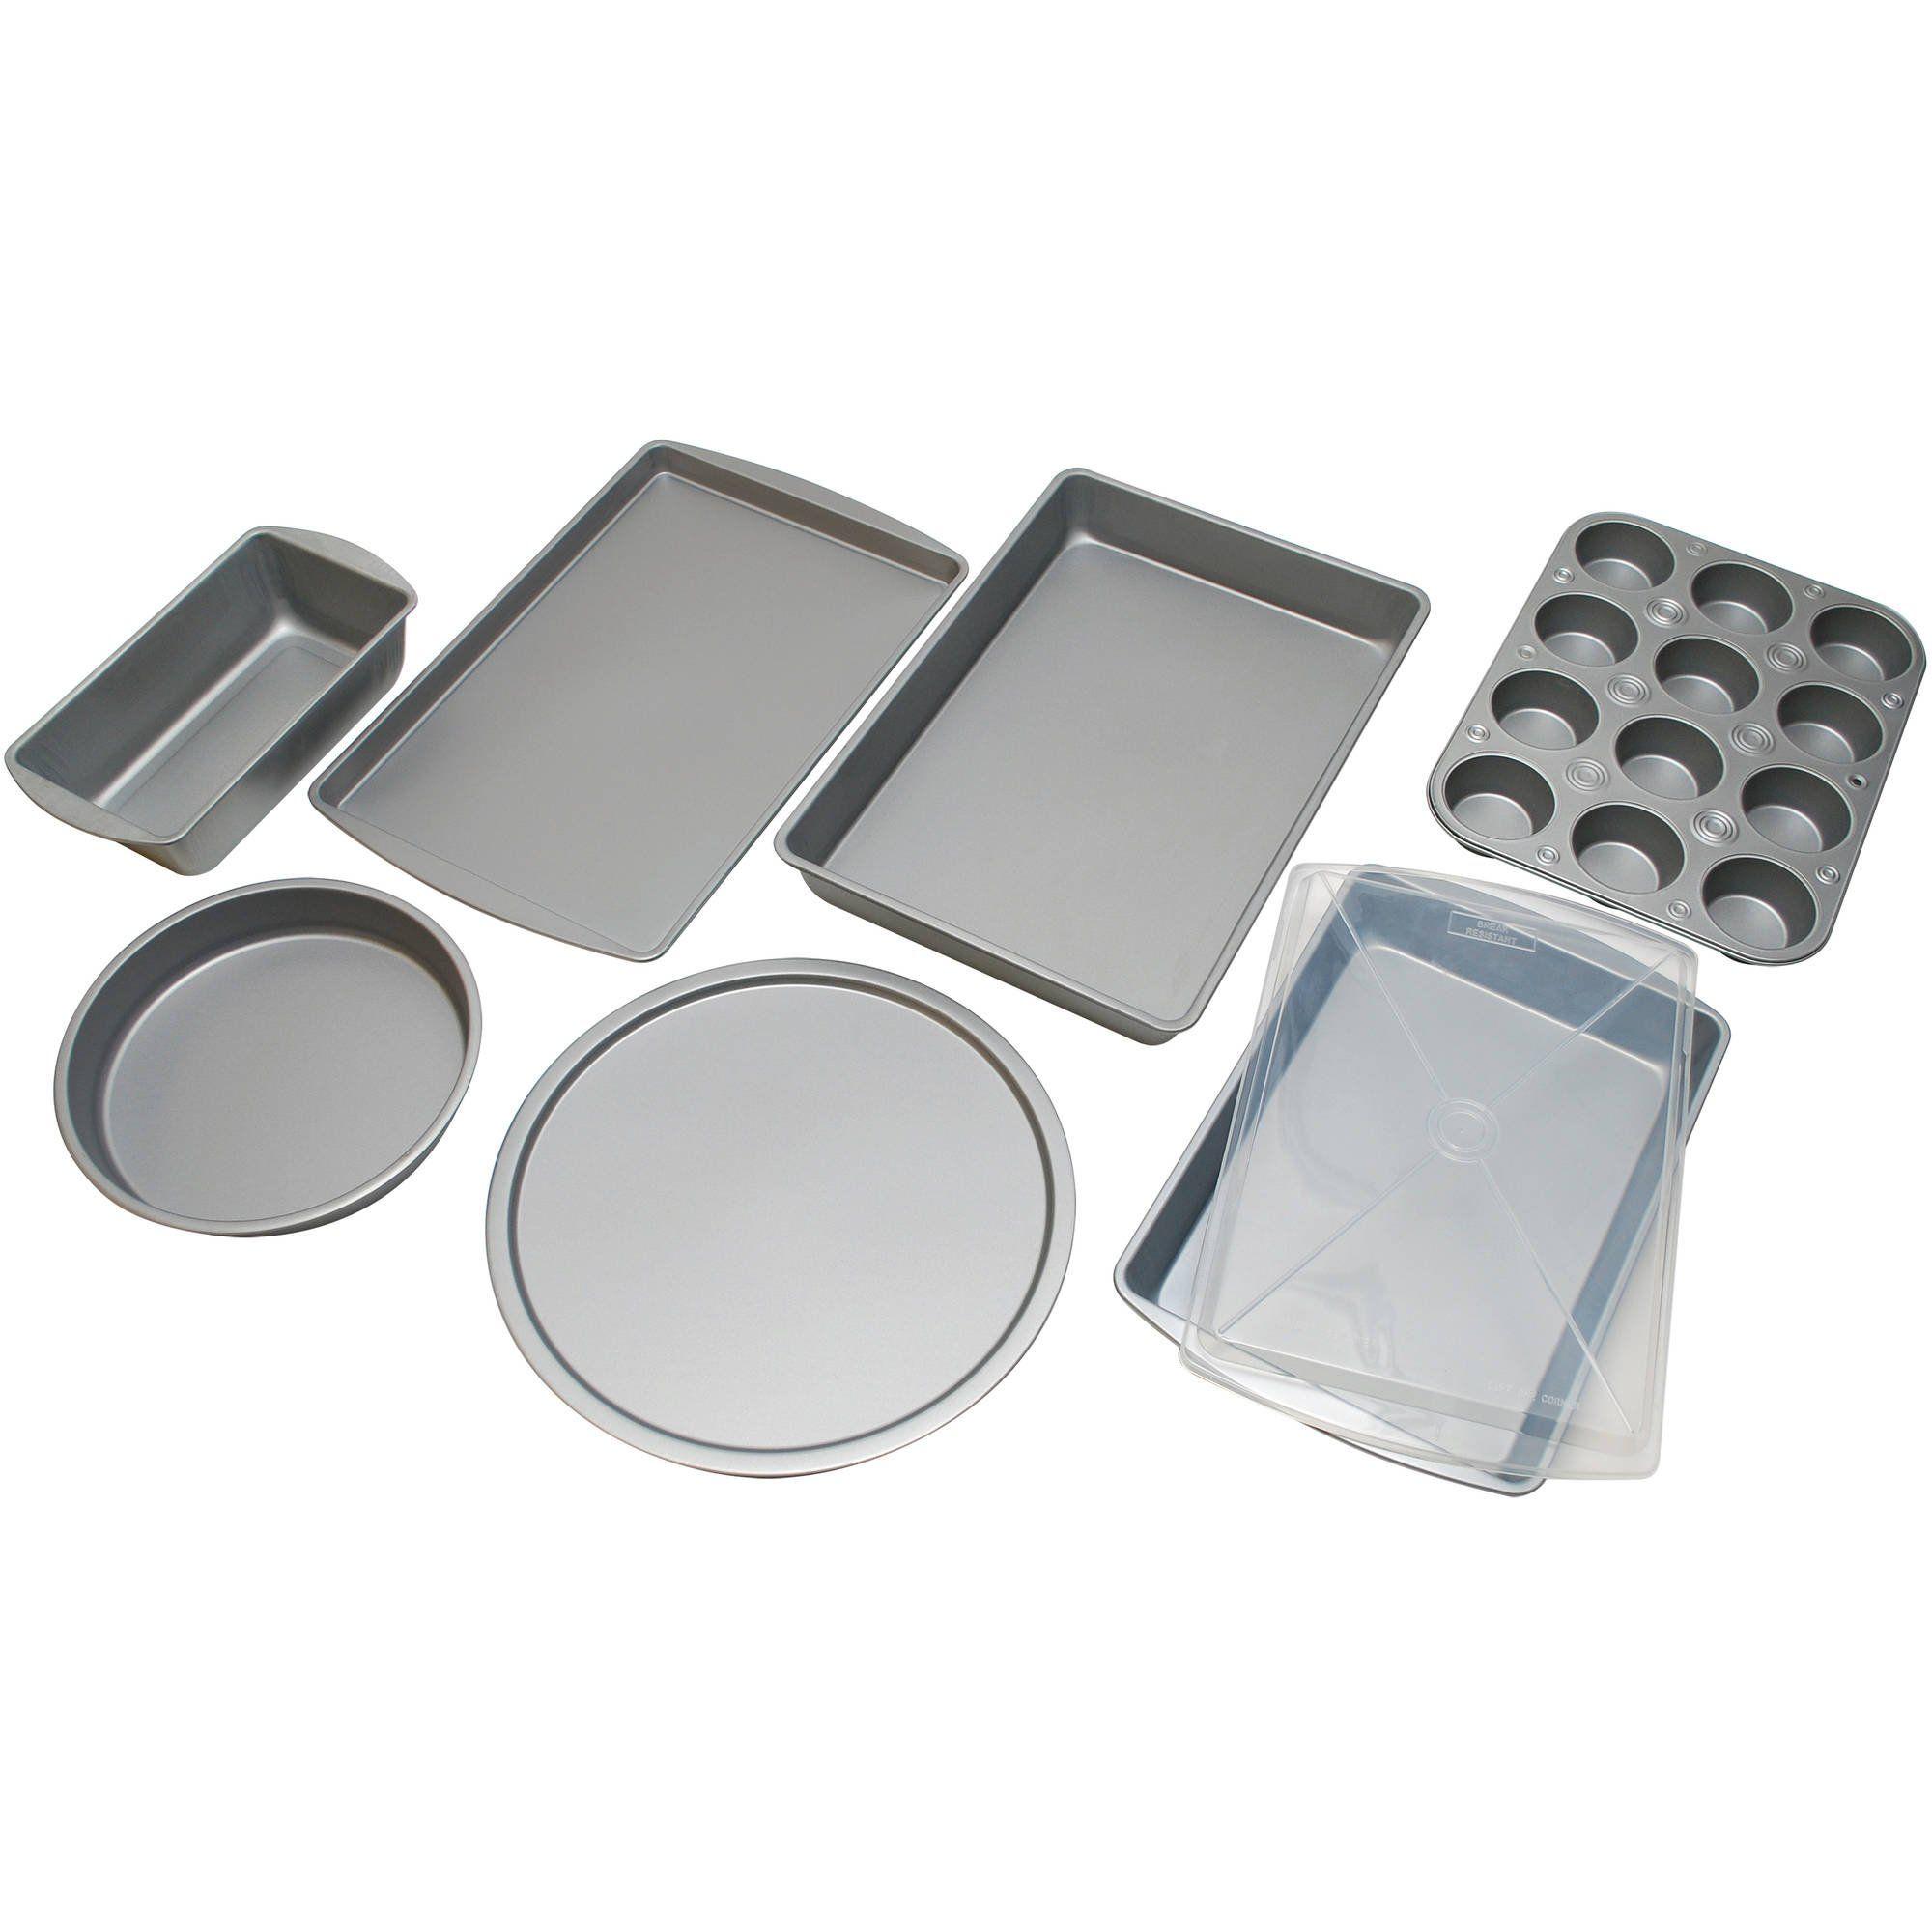 8pieceall the essentials bakeware set grey read more